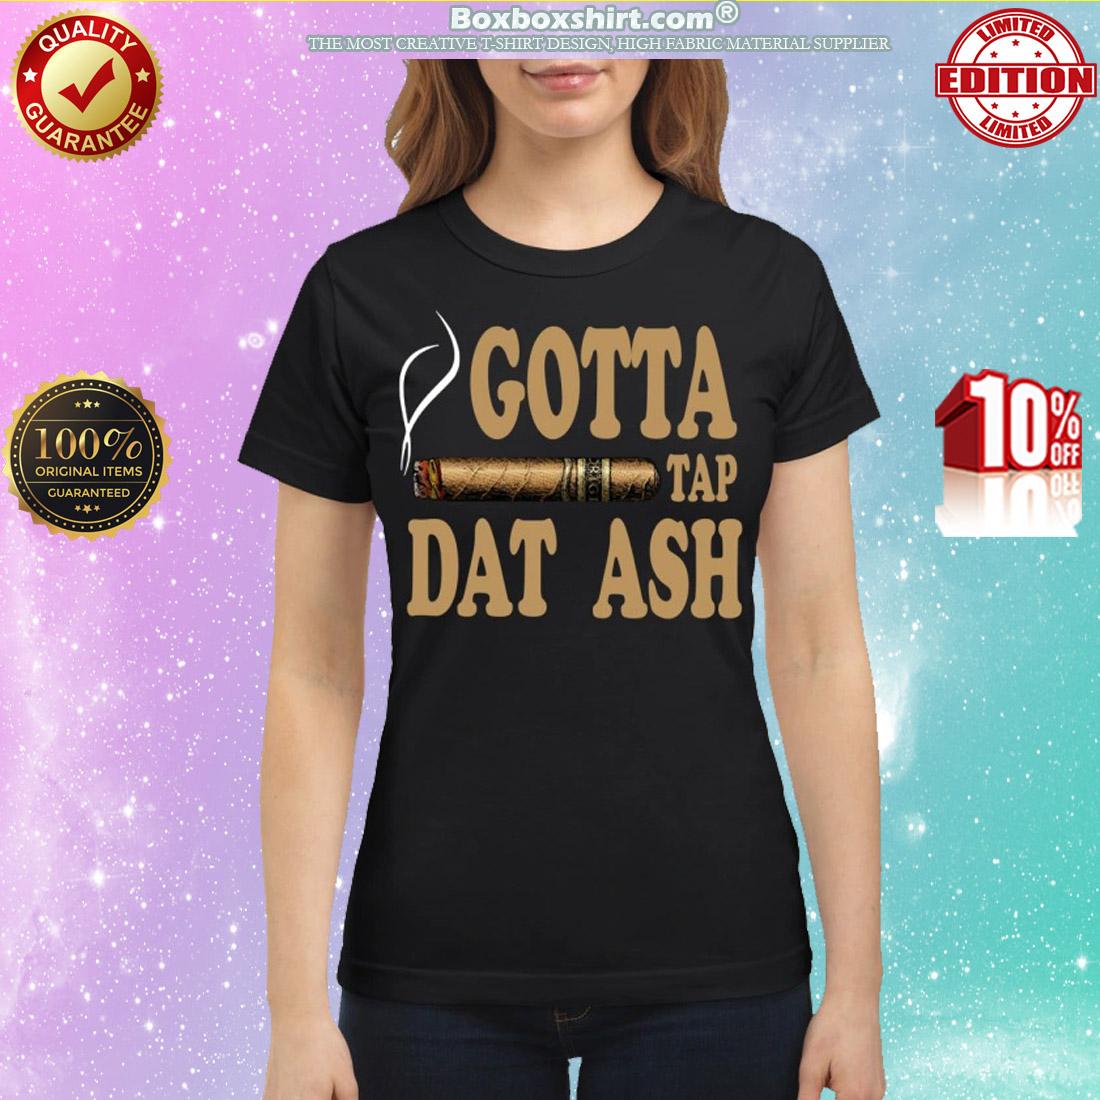 Cigar gotta tap dat ash classic shirt